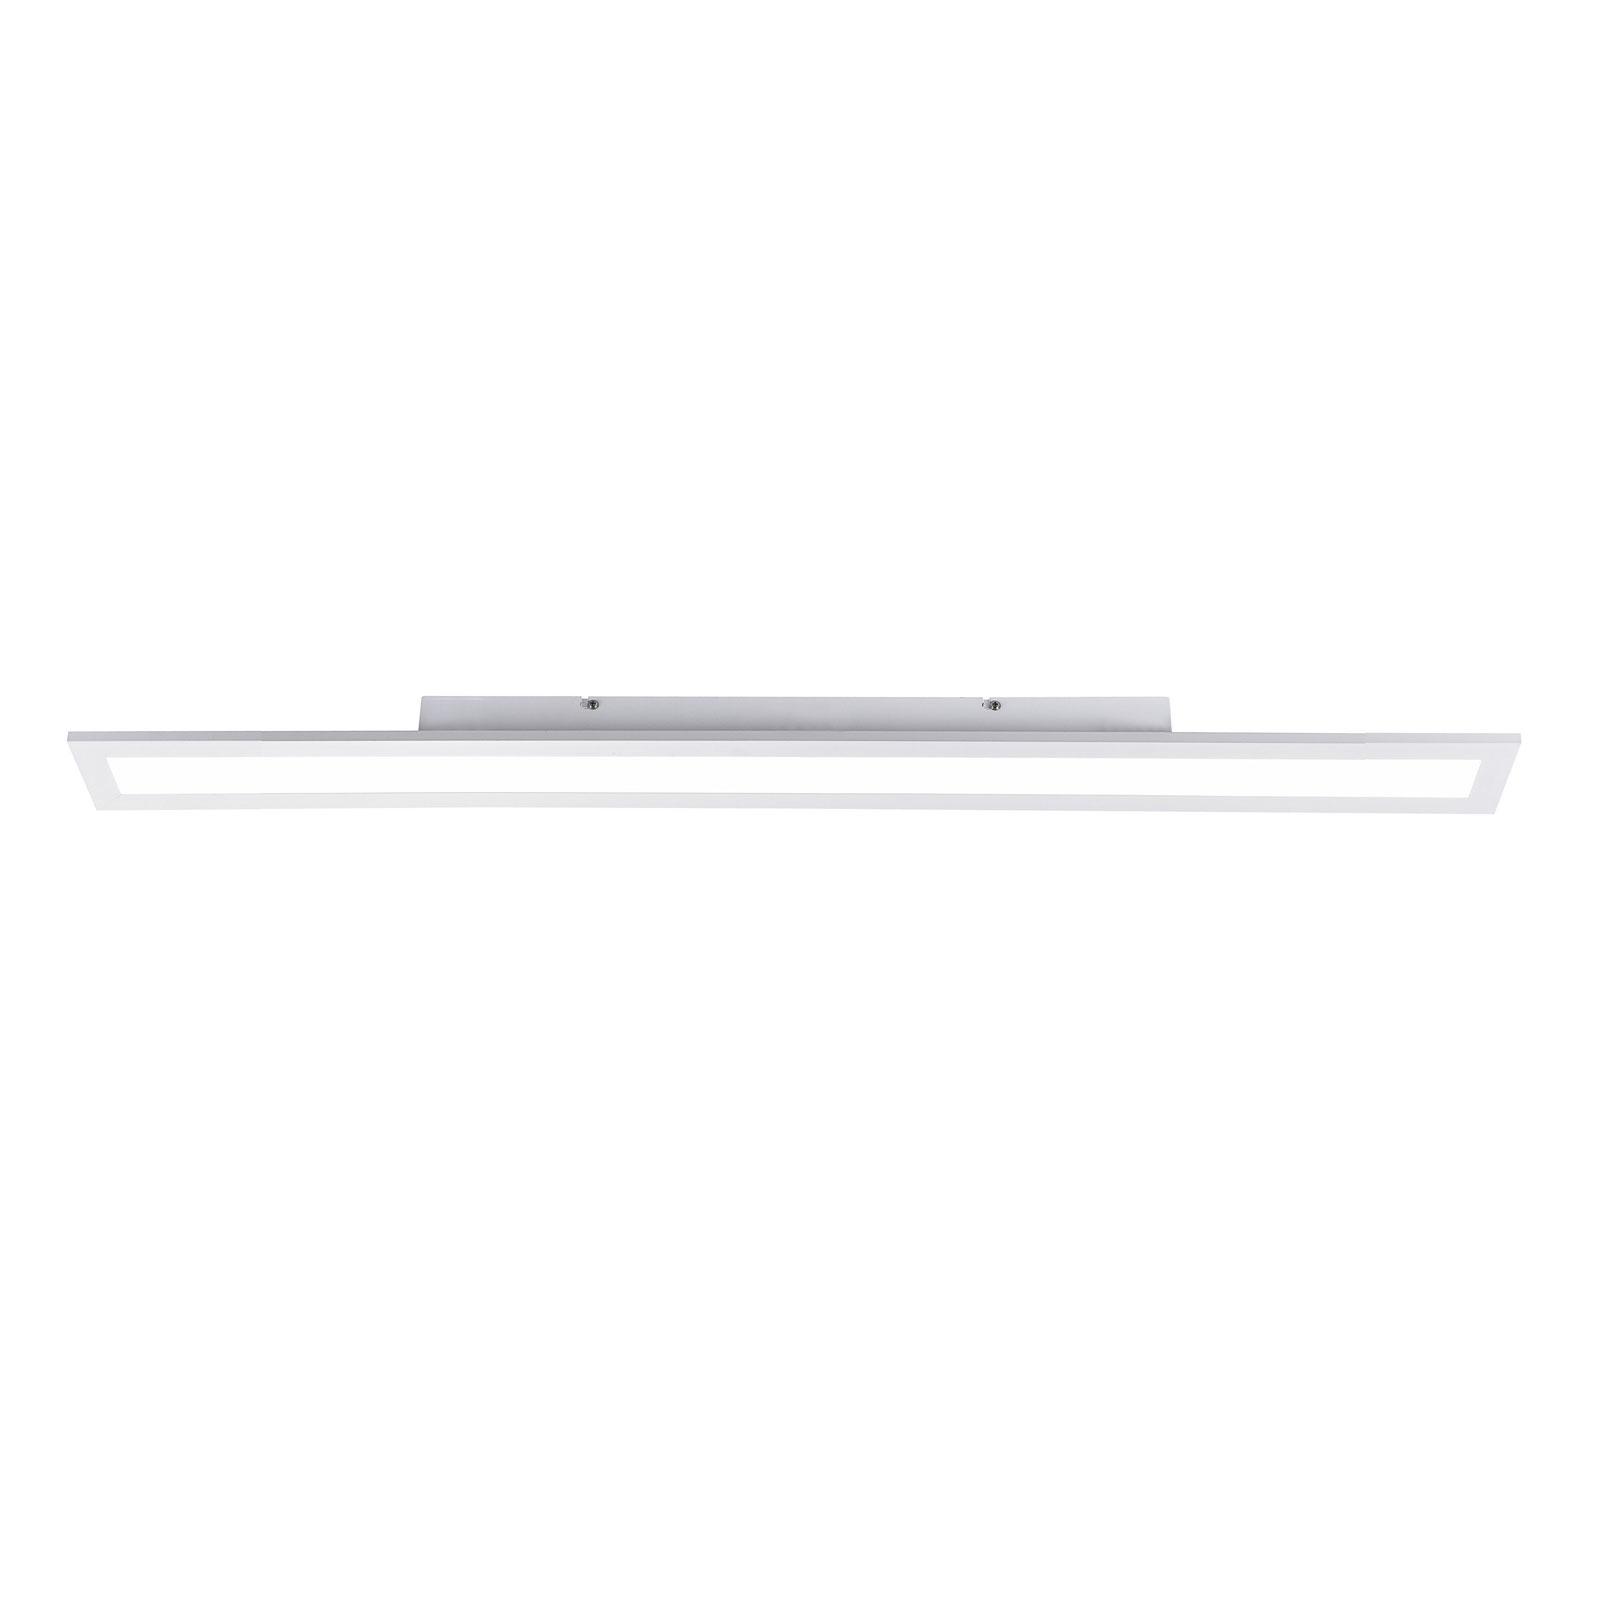 LED-Deckenlampe Fleet mit Sensor, 100x10 cm